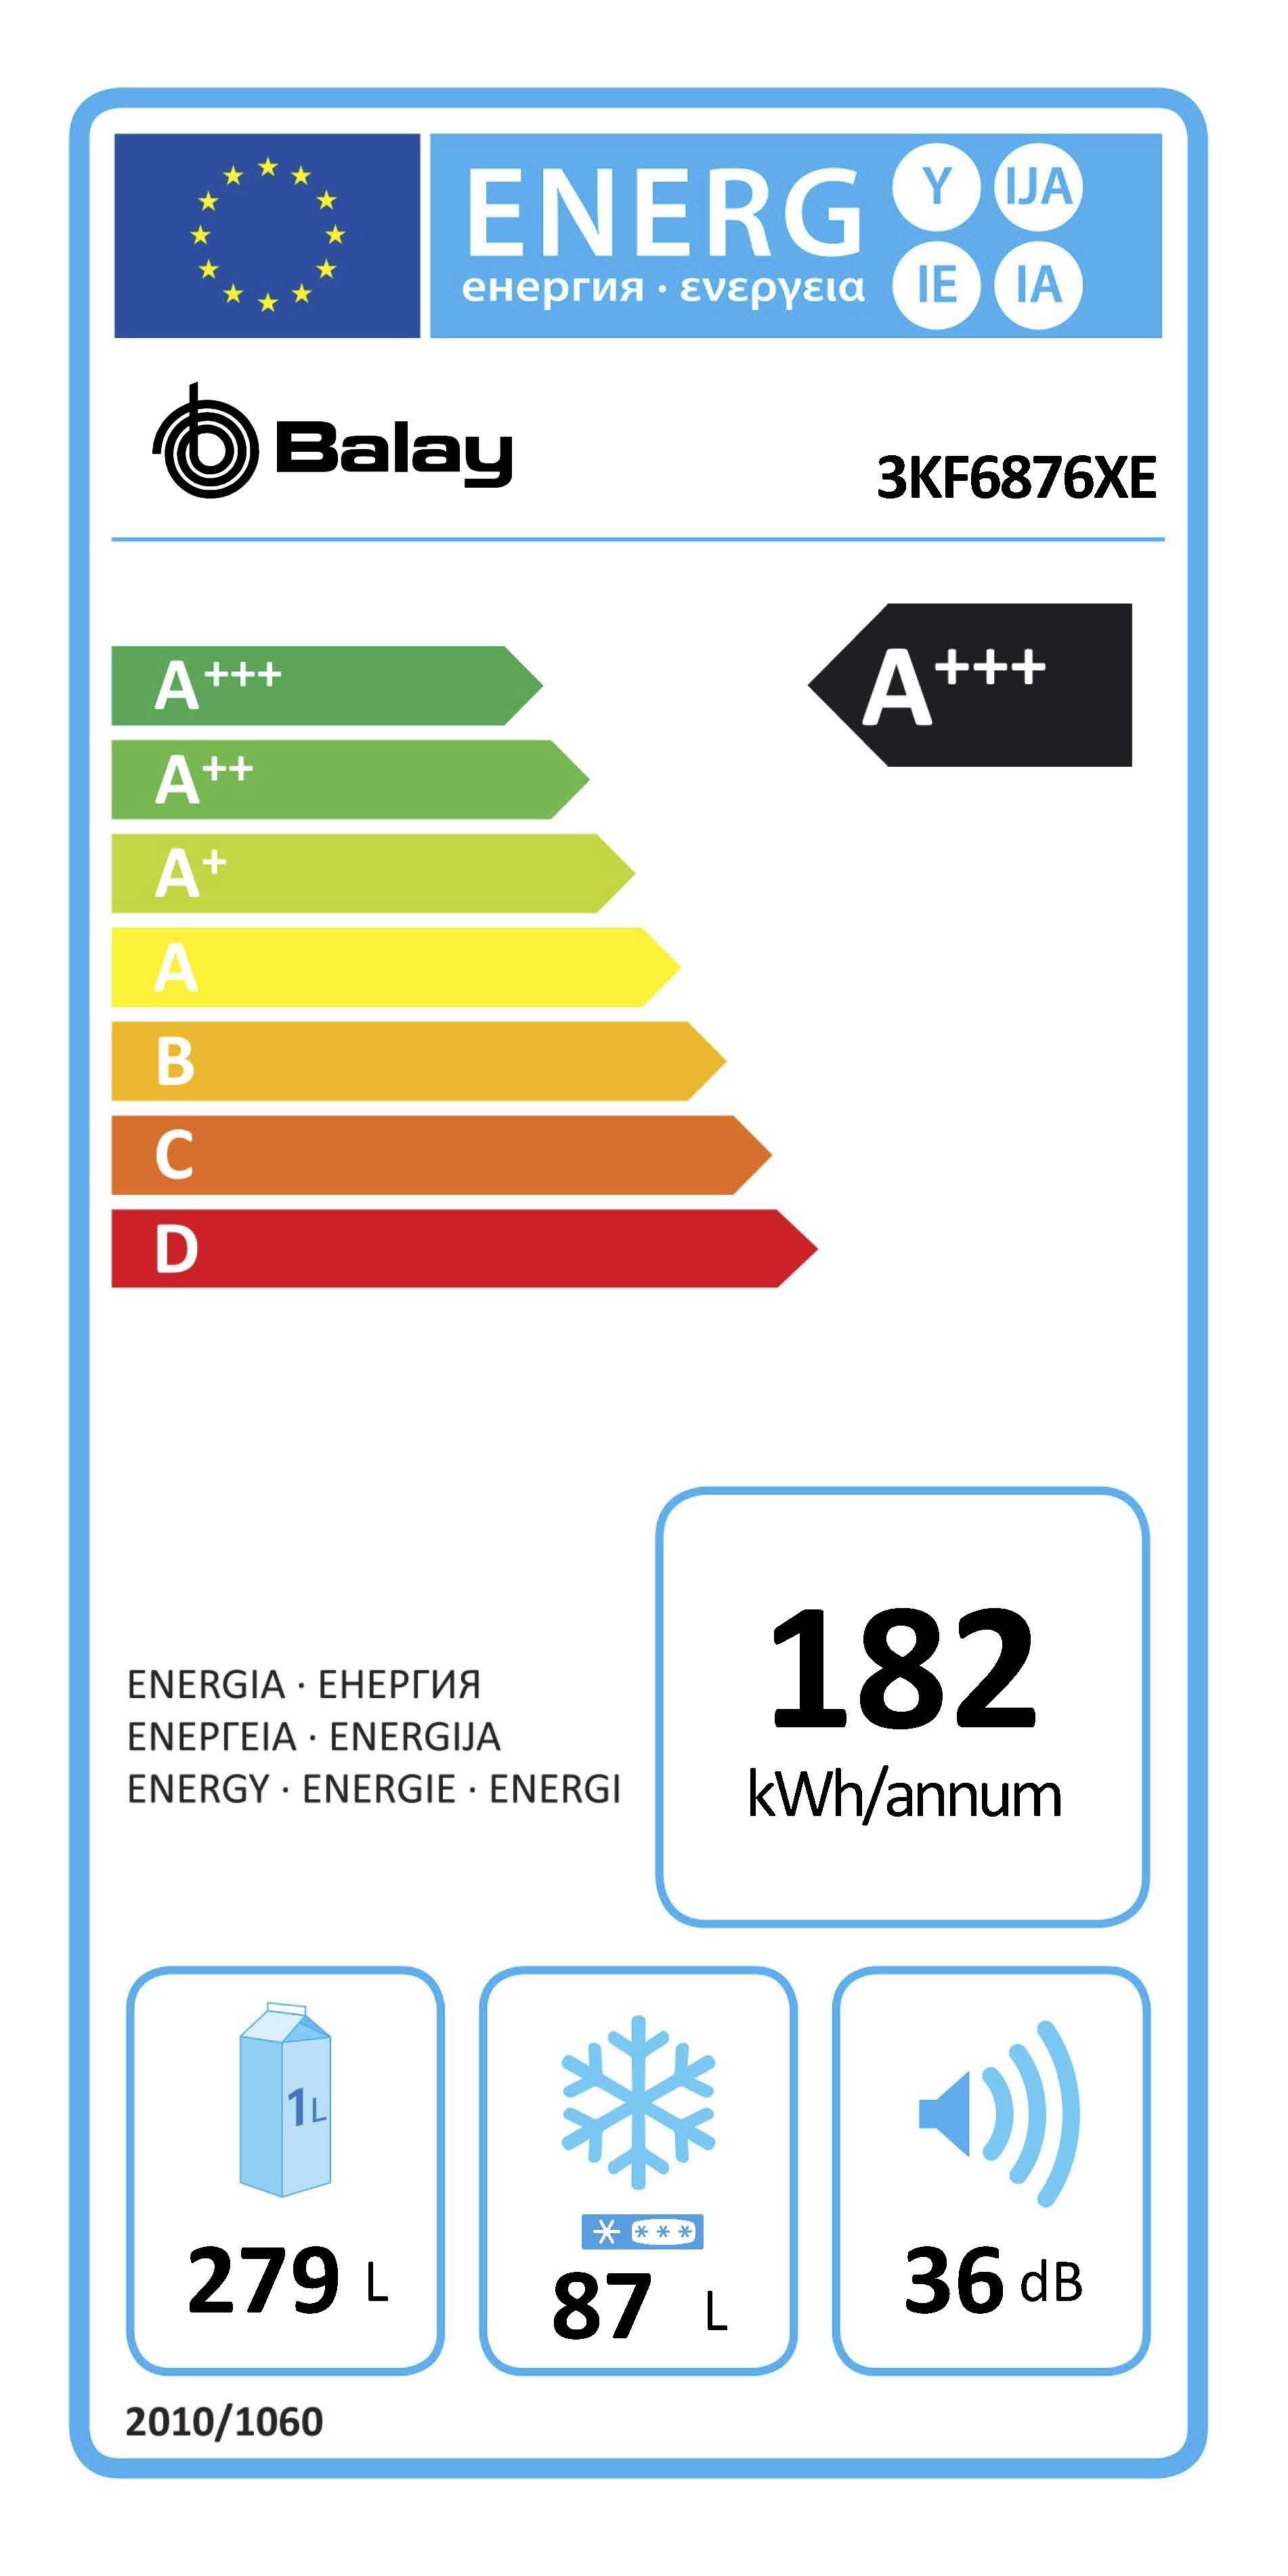 Etiqueta de Eficiencia Energética - 3KF6876XE